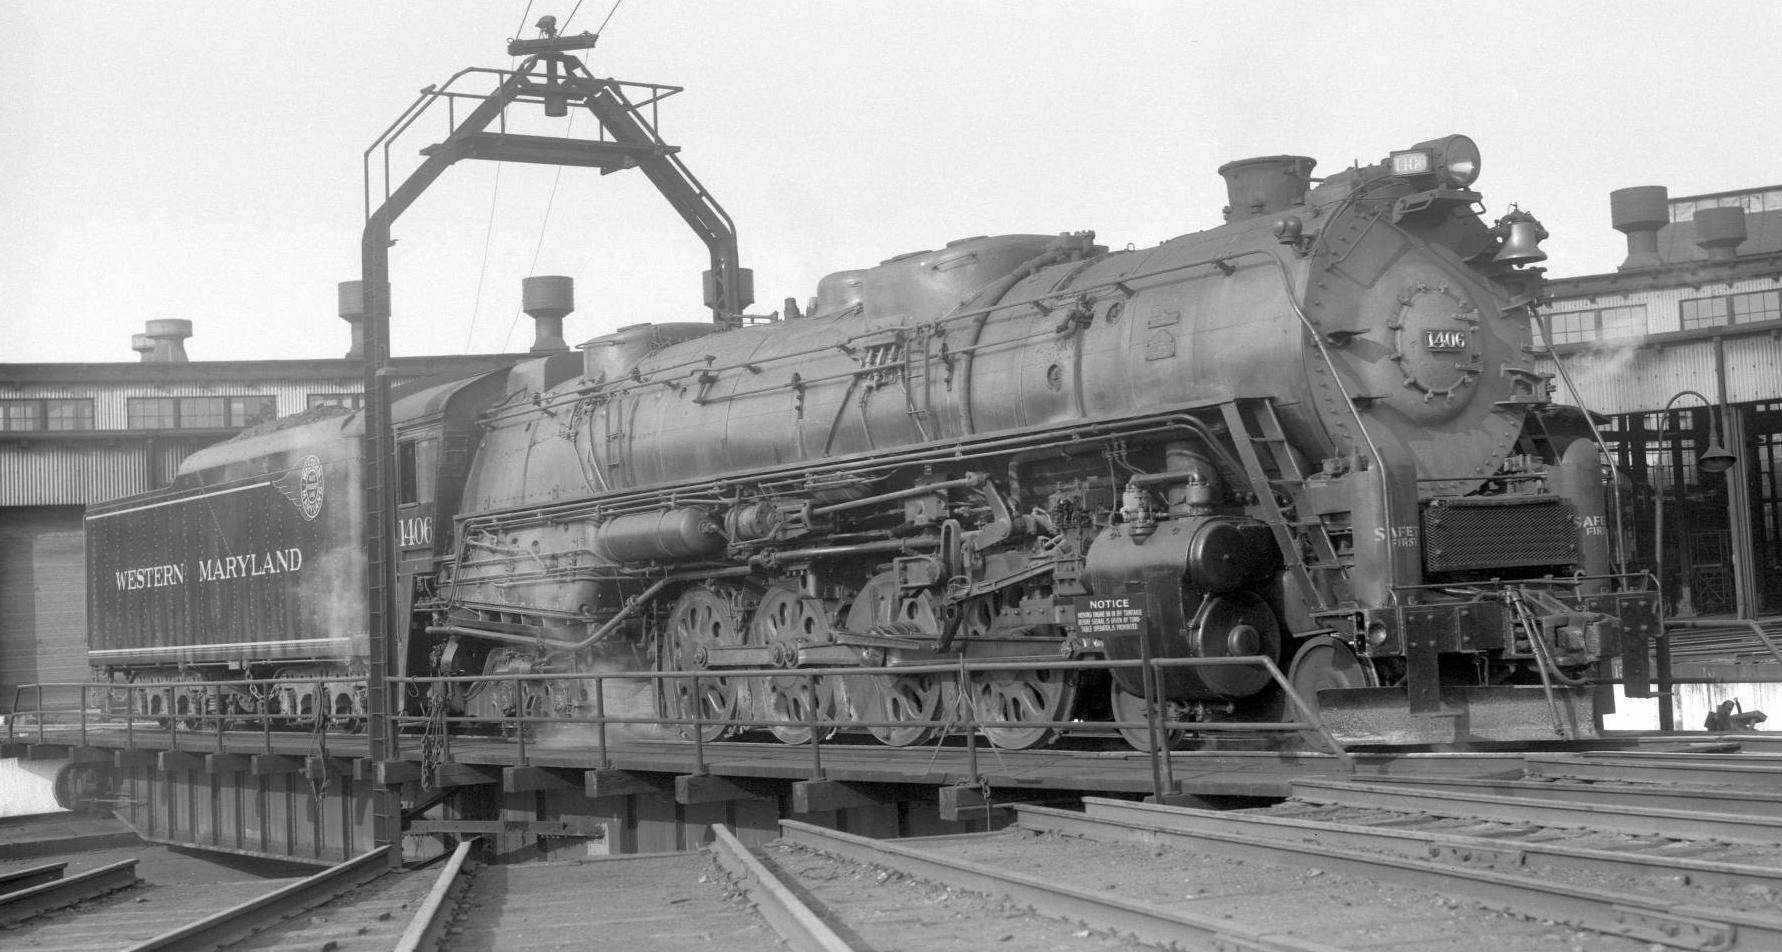 Http www american rails com images cj4841409 jpg